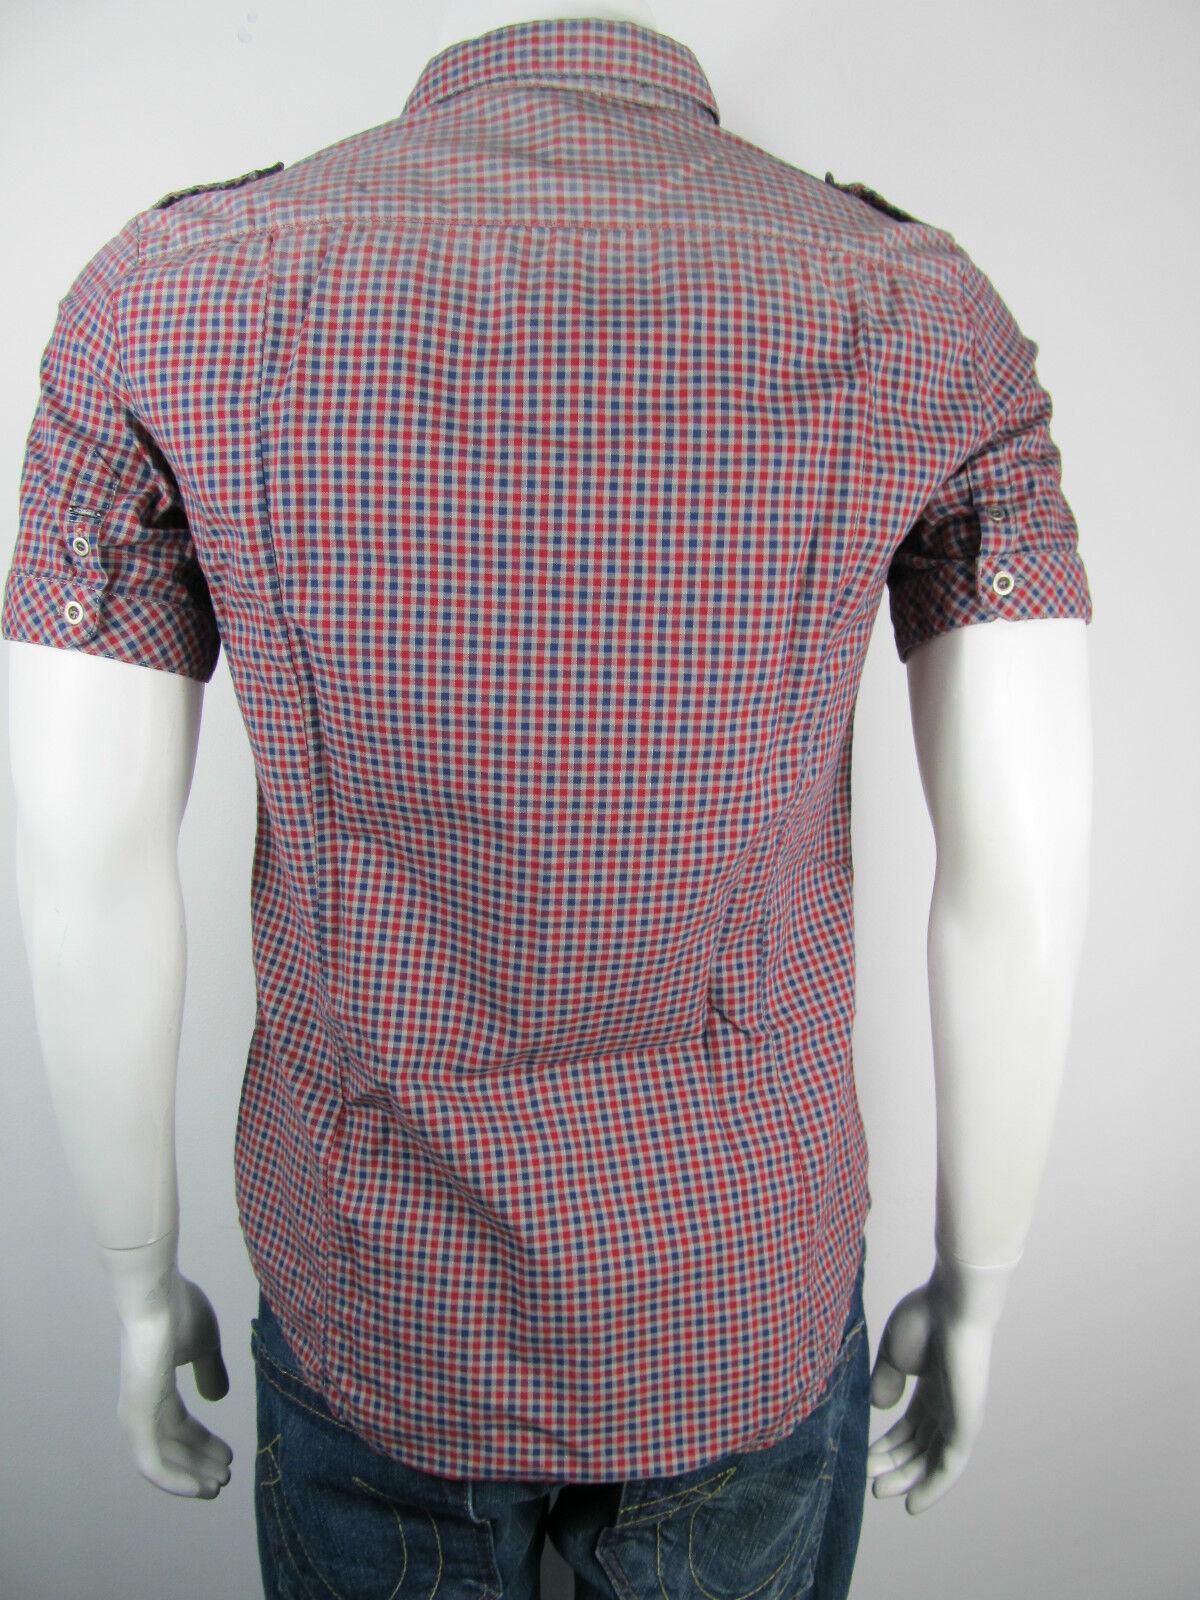 Bray Steve Alan Shirt Camicia Camicia Camicia camisas Camicia 12r5005 Nuovo A Quadri M e6095c